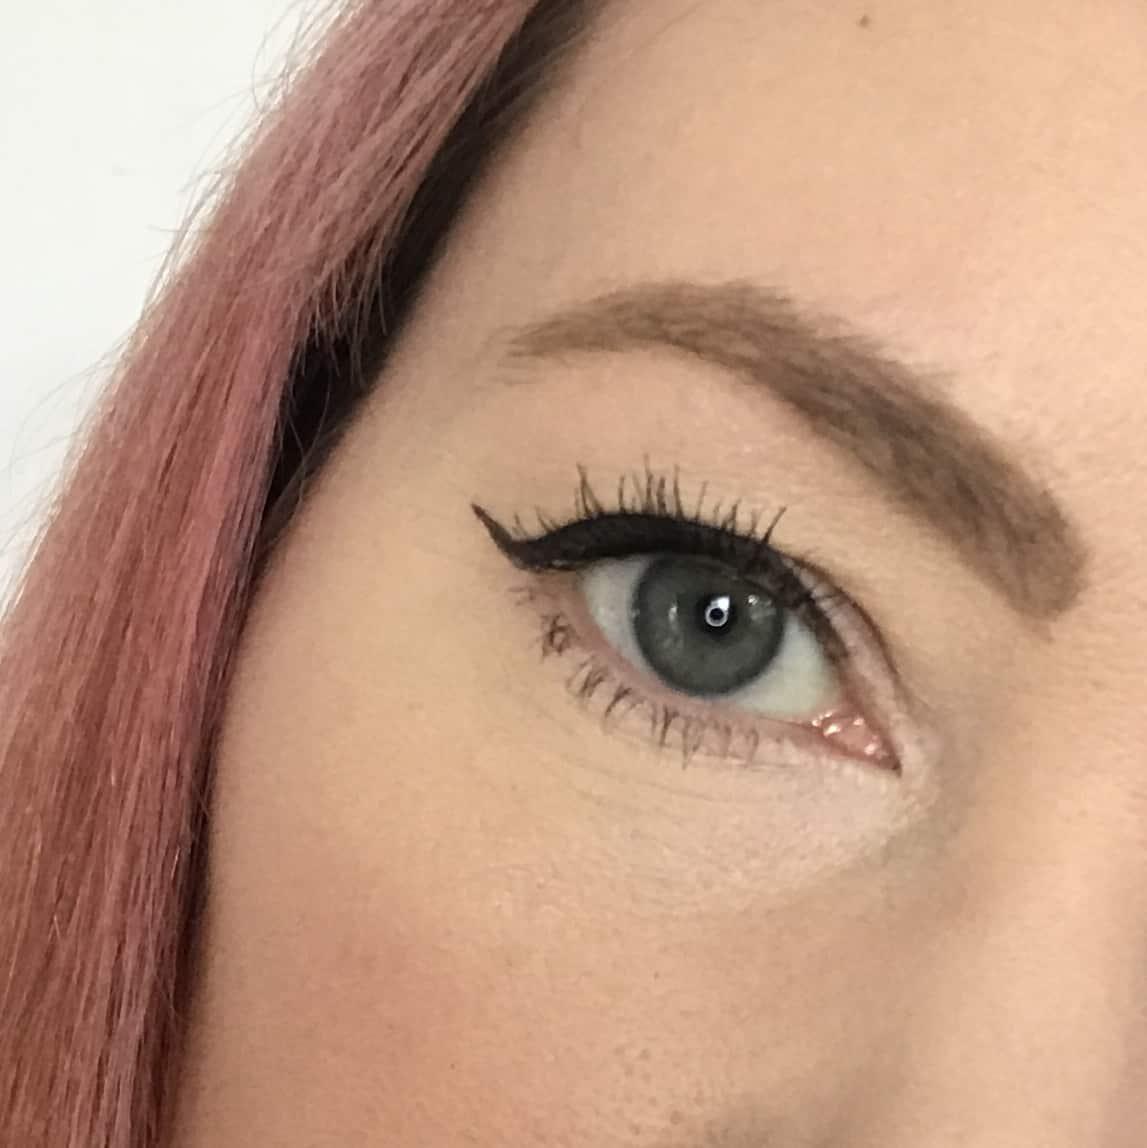 Wearing Inika Certified Organic Liquid Eyeliner from the March Love Lula Beauty Box